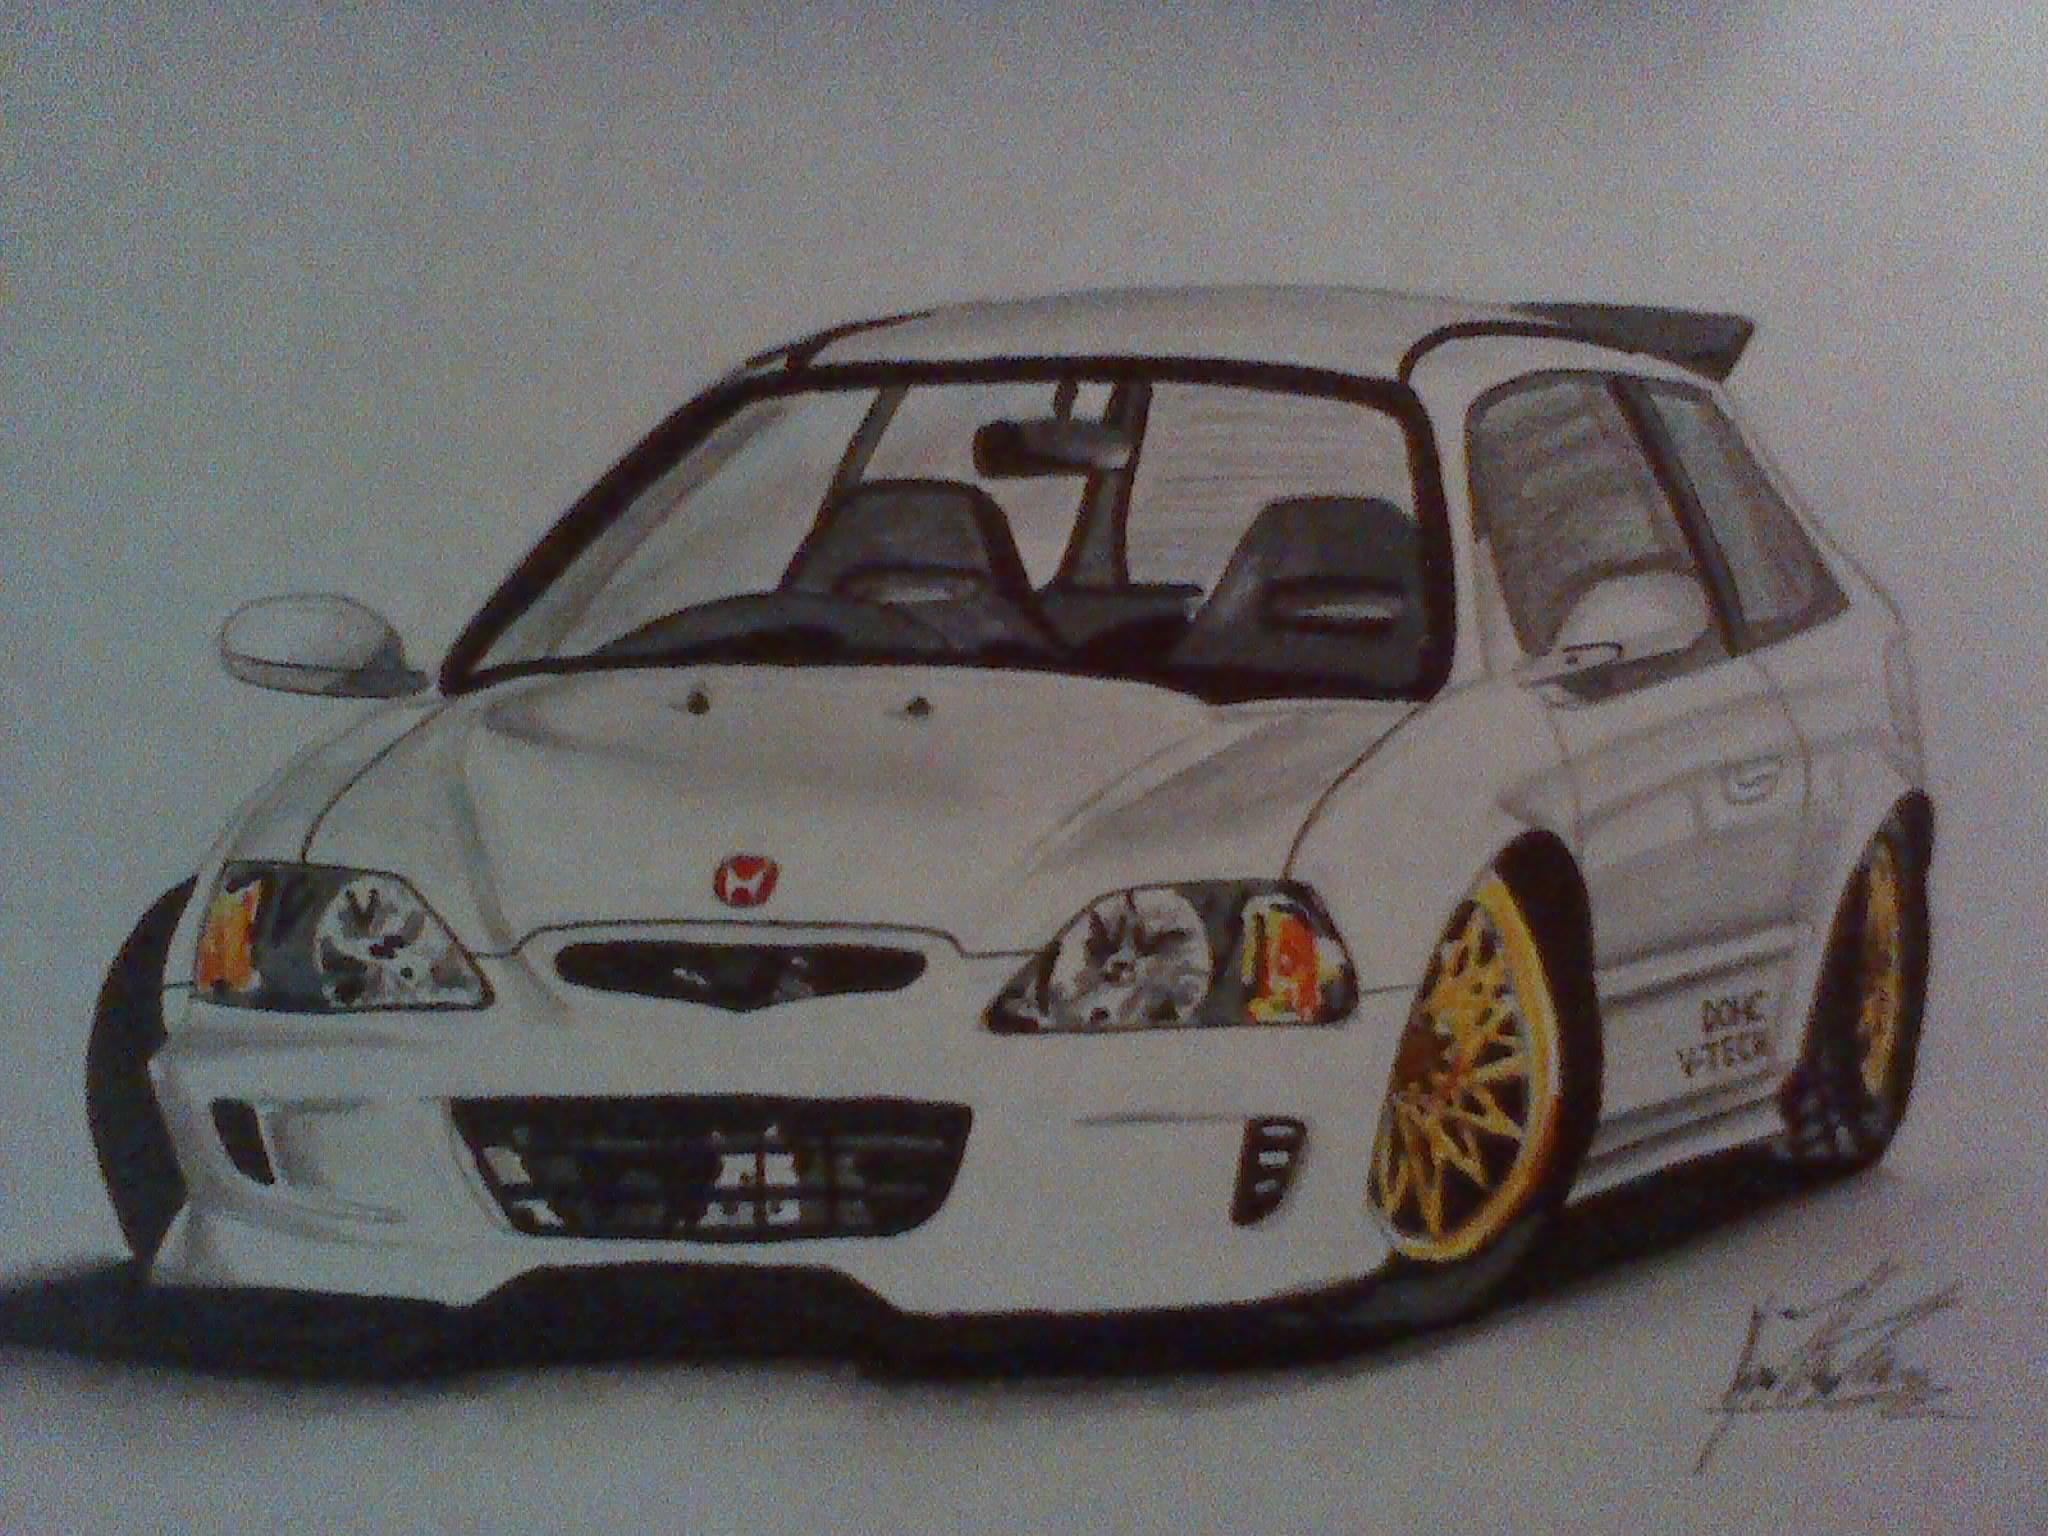 2048x1536 A Drawing I Did Of A Honda Civic (Ek) Type R Car Drawings